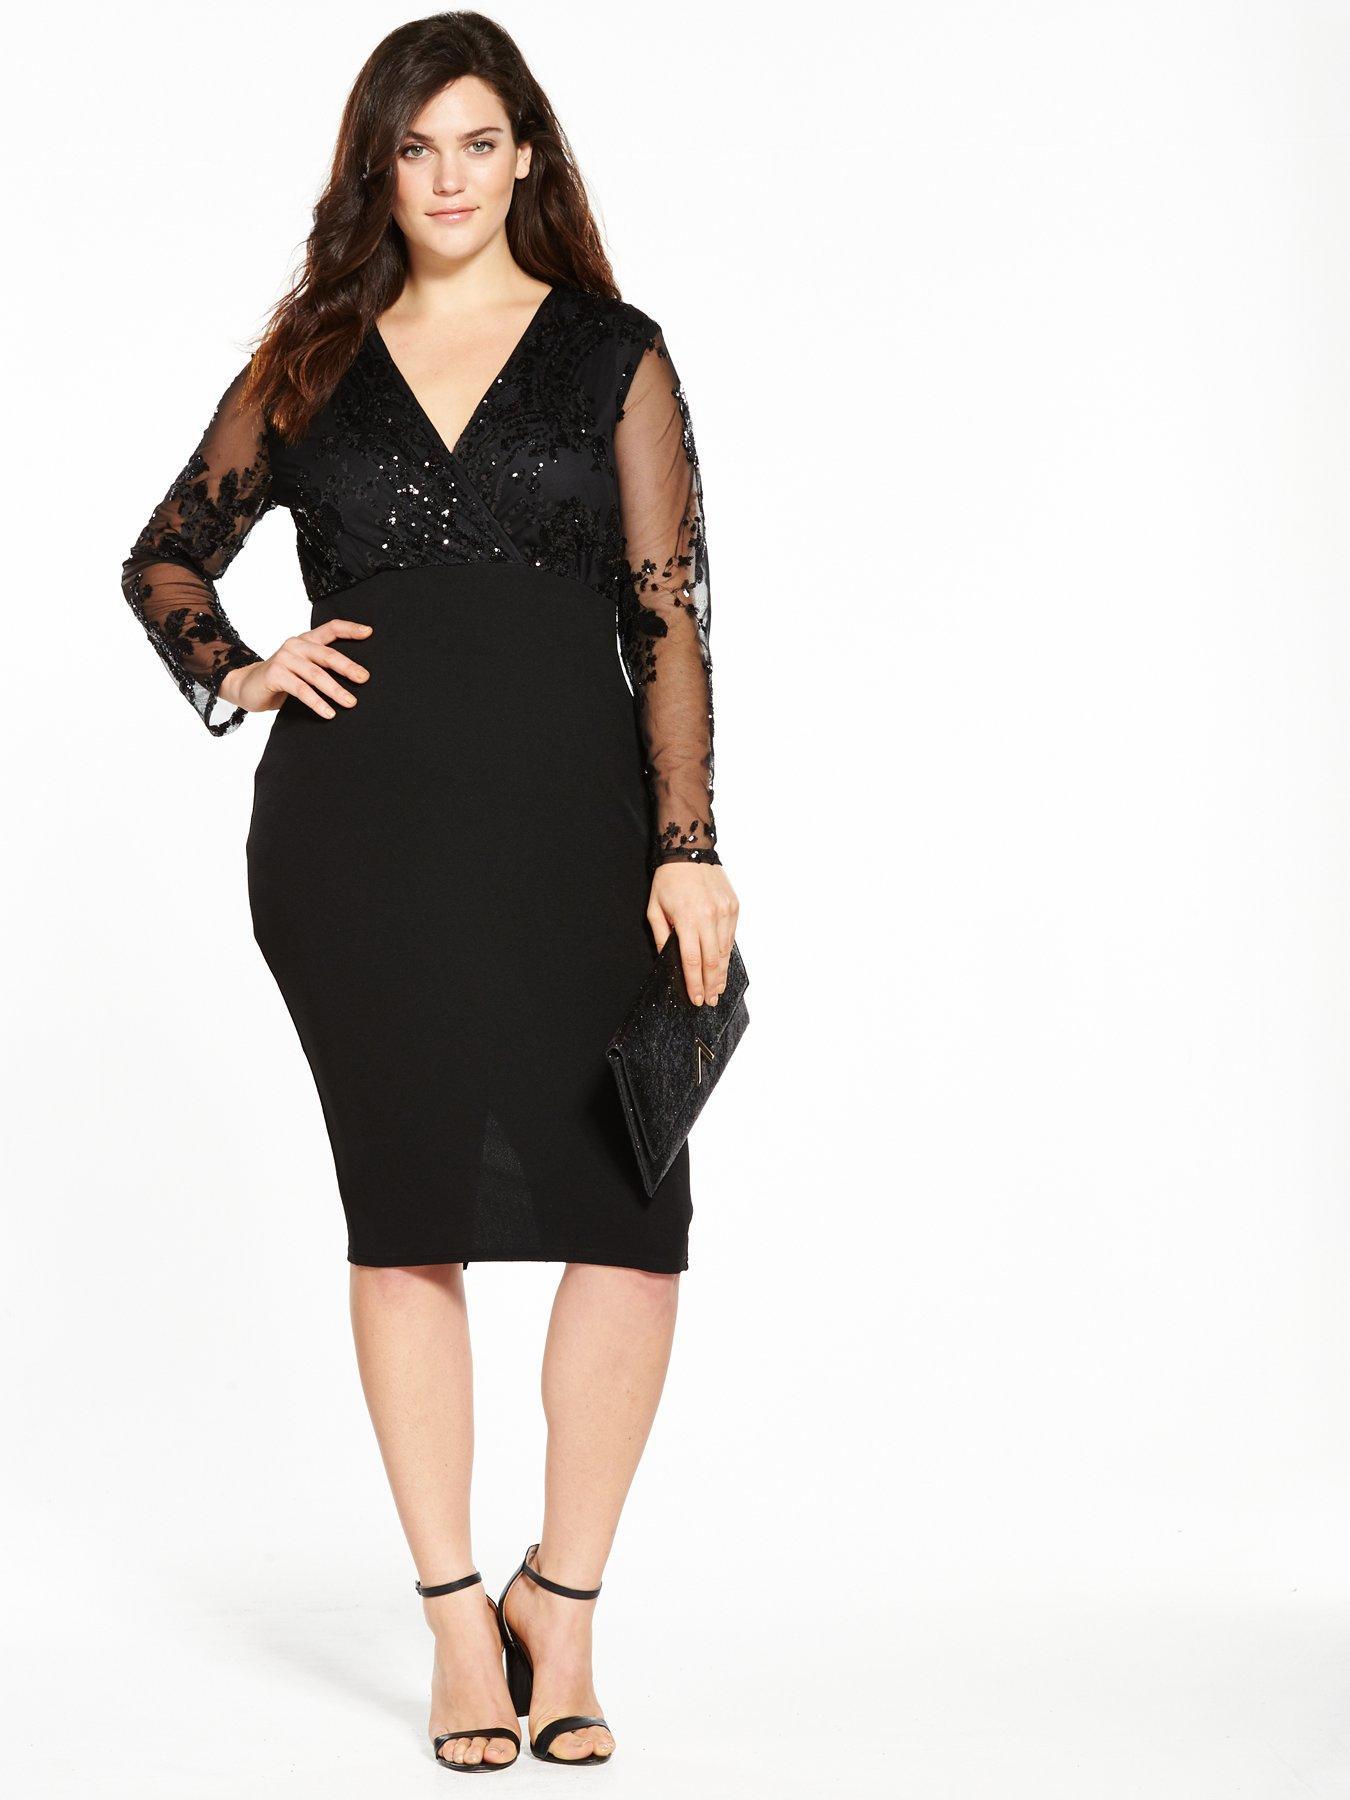 Sparkly dresses cheap uk